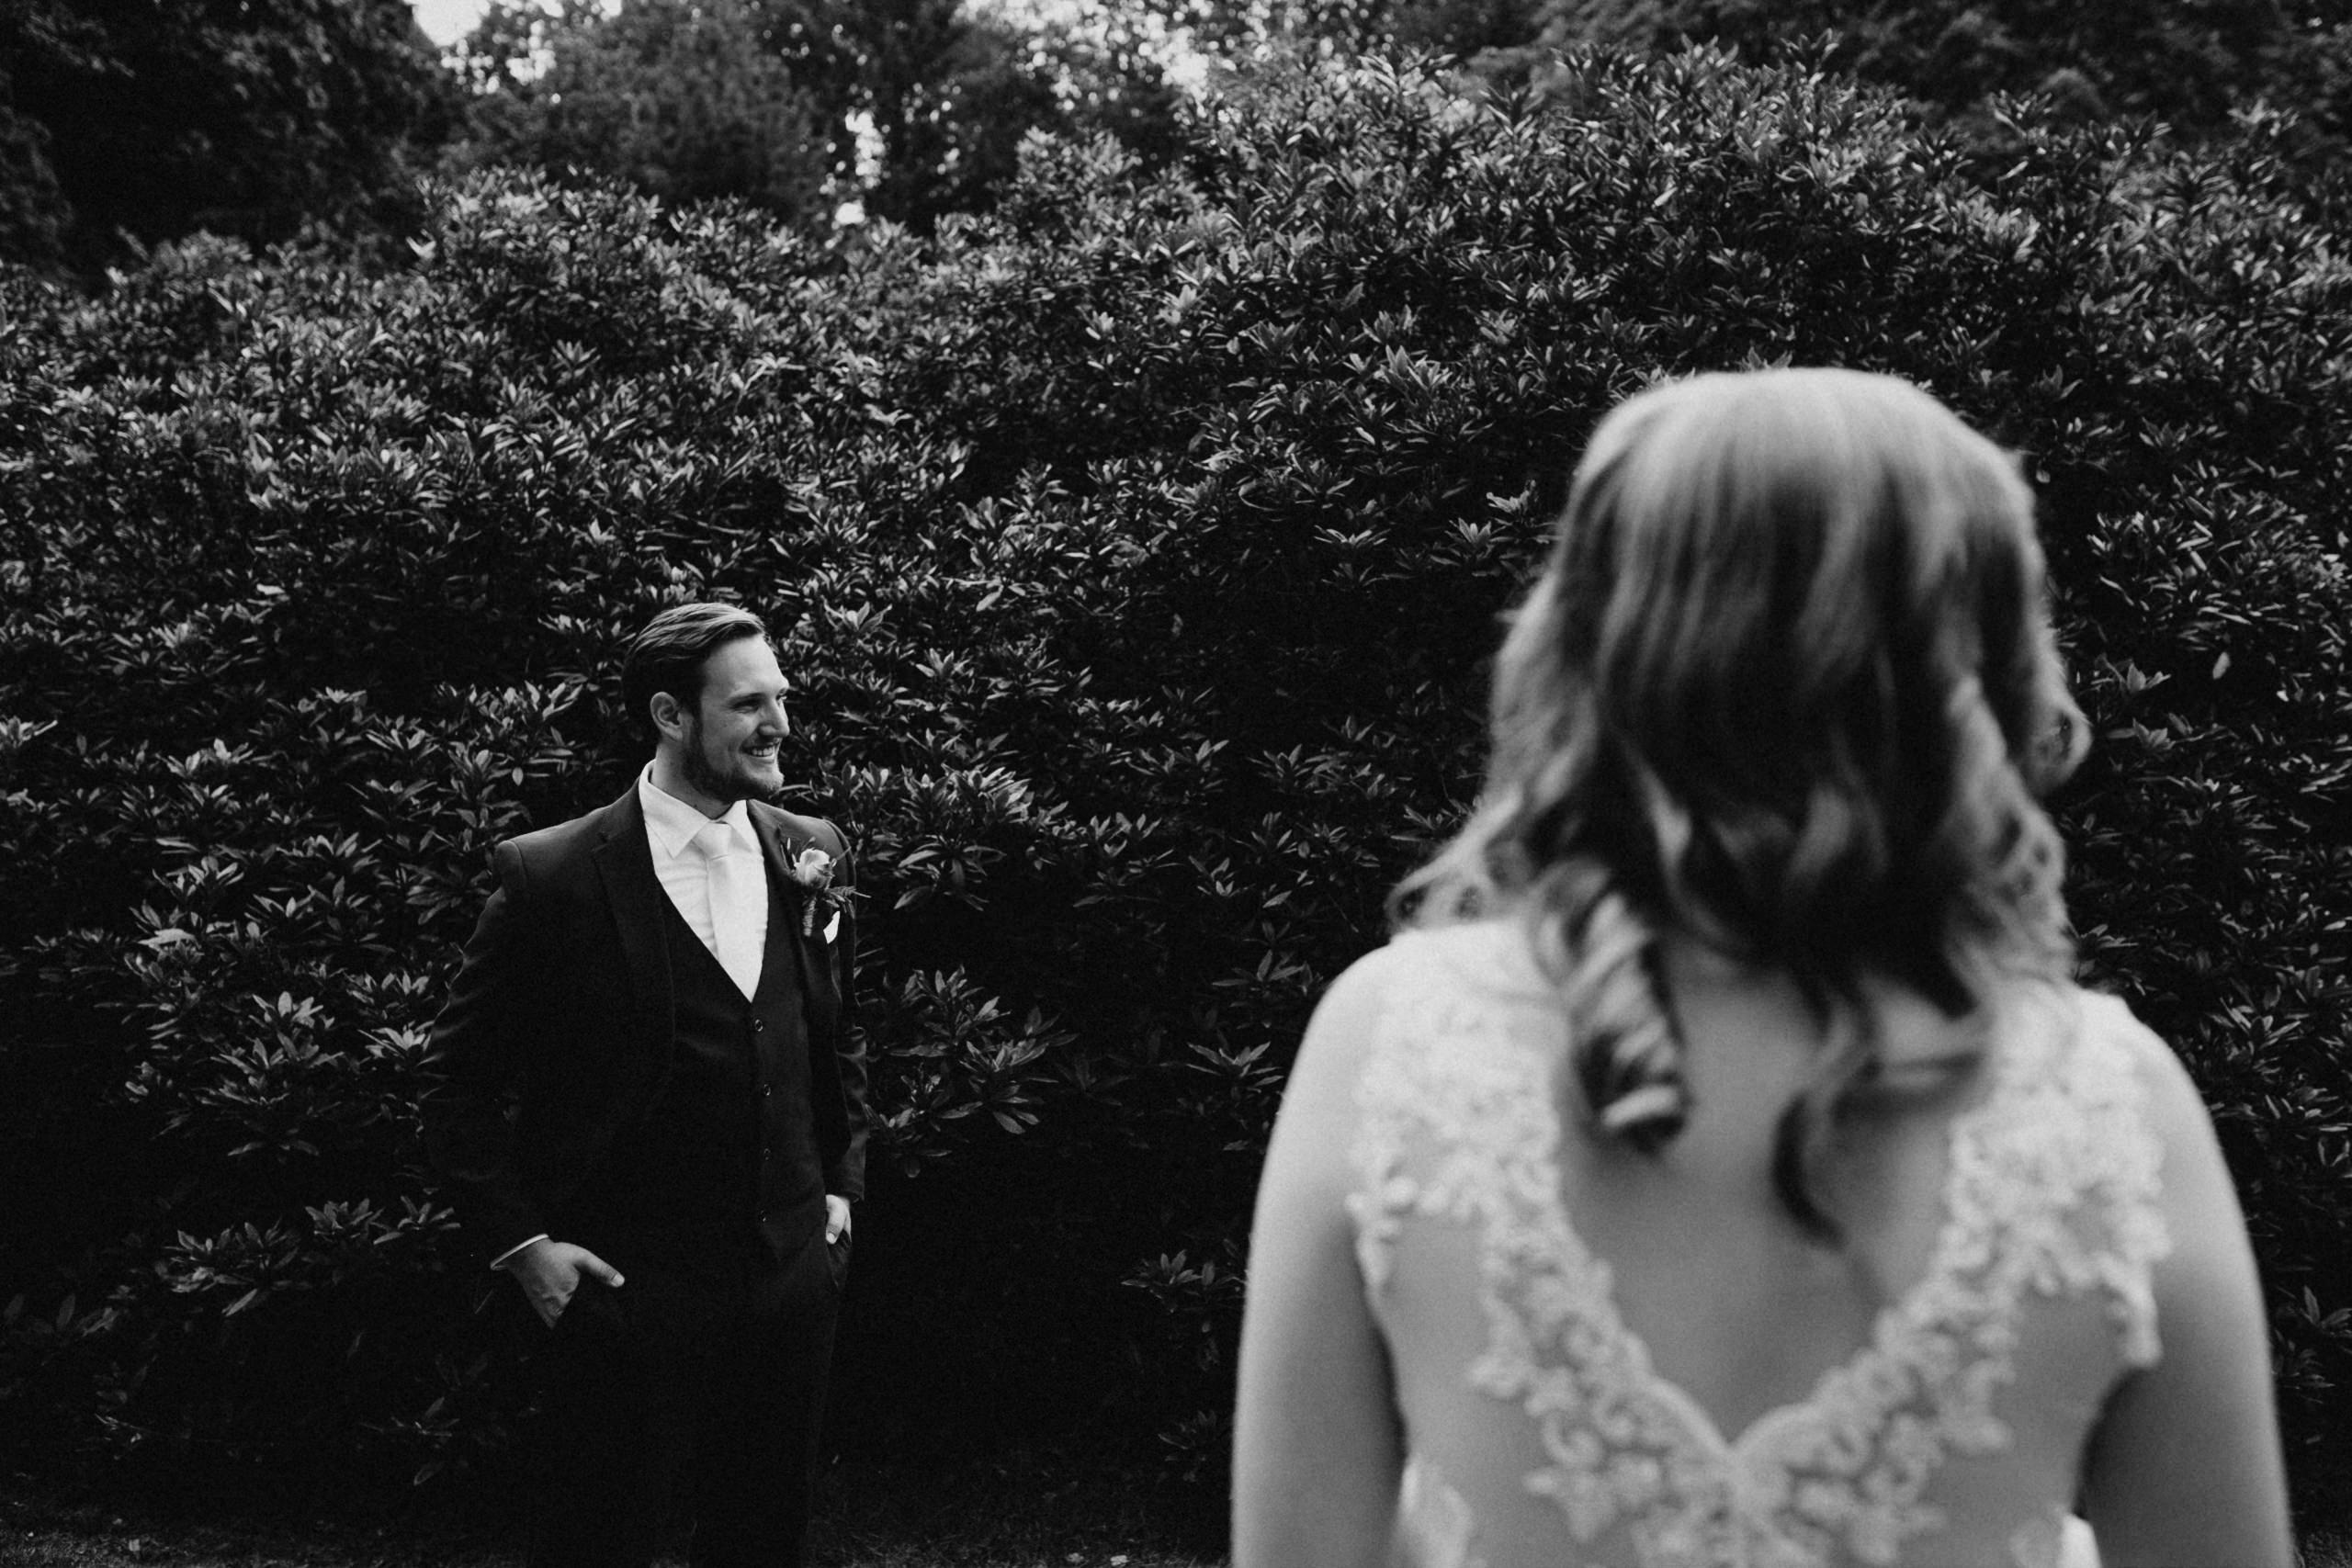 jorge-jager-bruiloft-fotografie-residence-rhenen